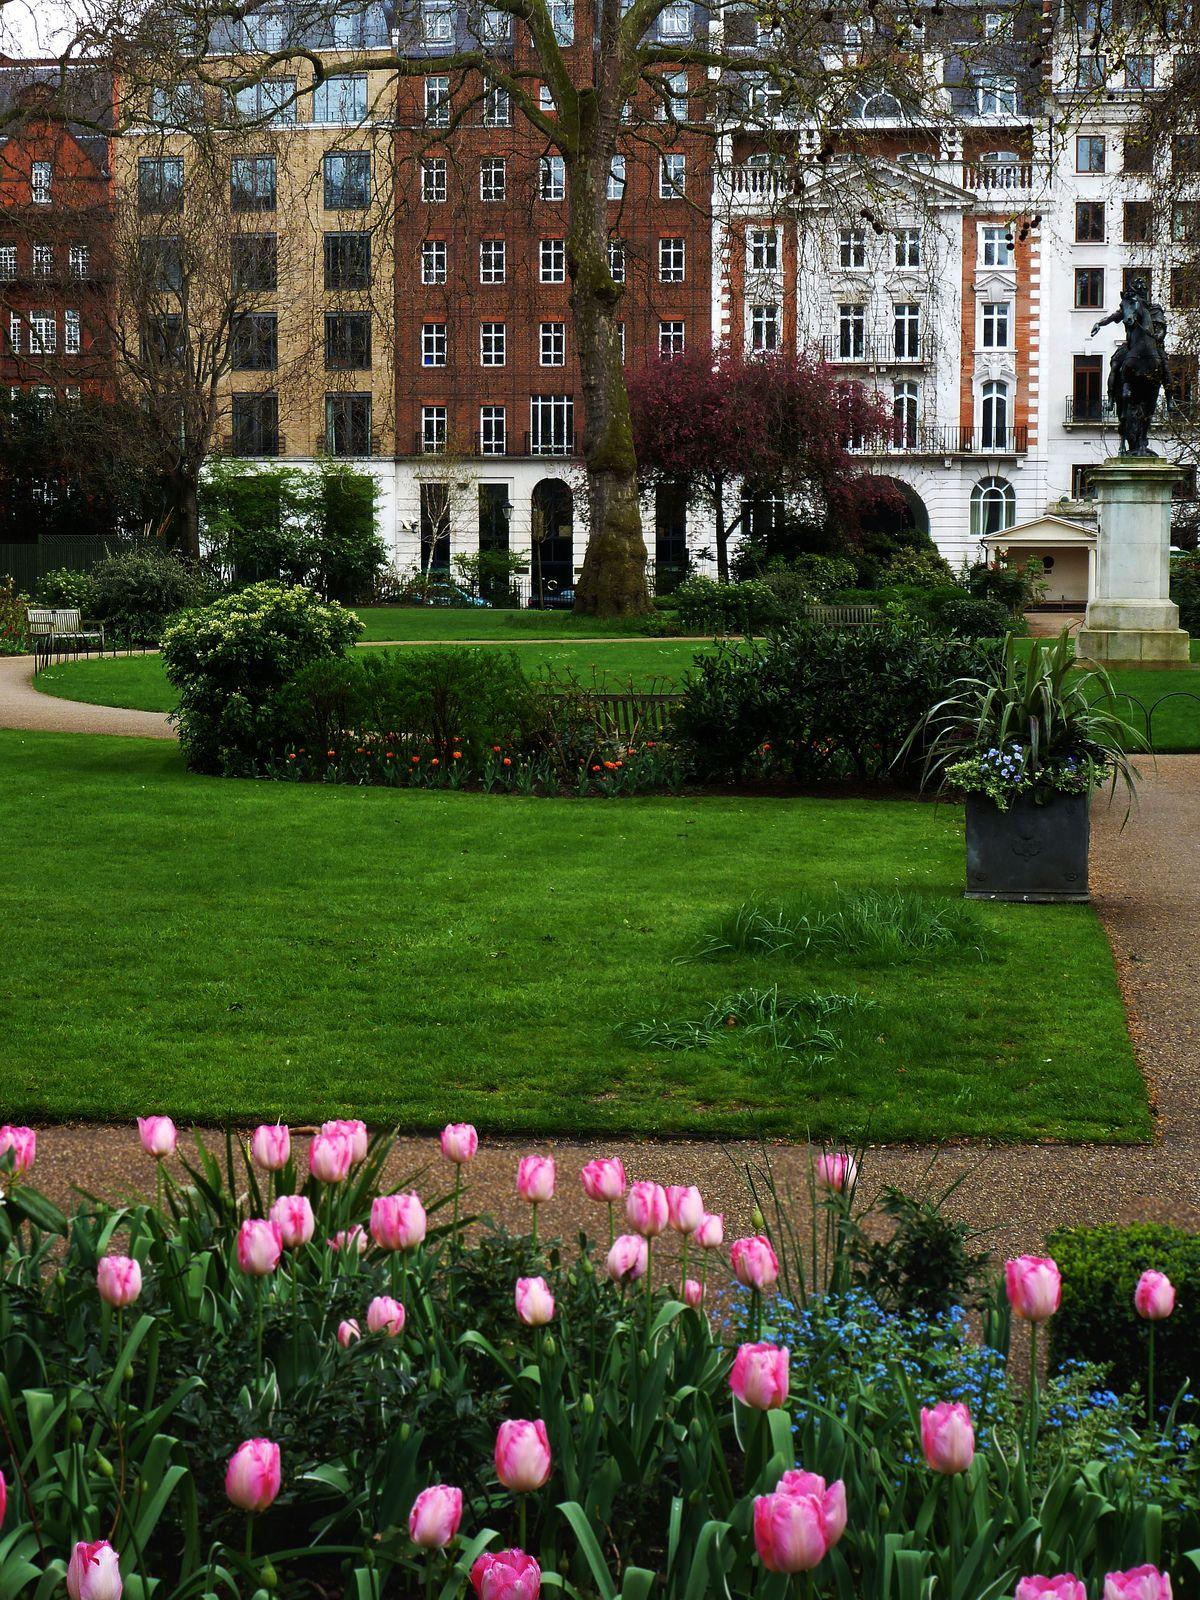 St James's Square in London, May.   http://enchantedengland.tumblr.com/image/55219334245